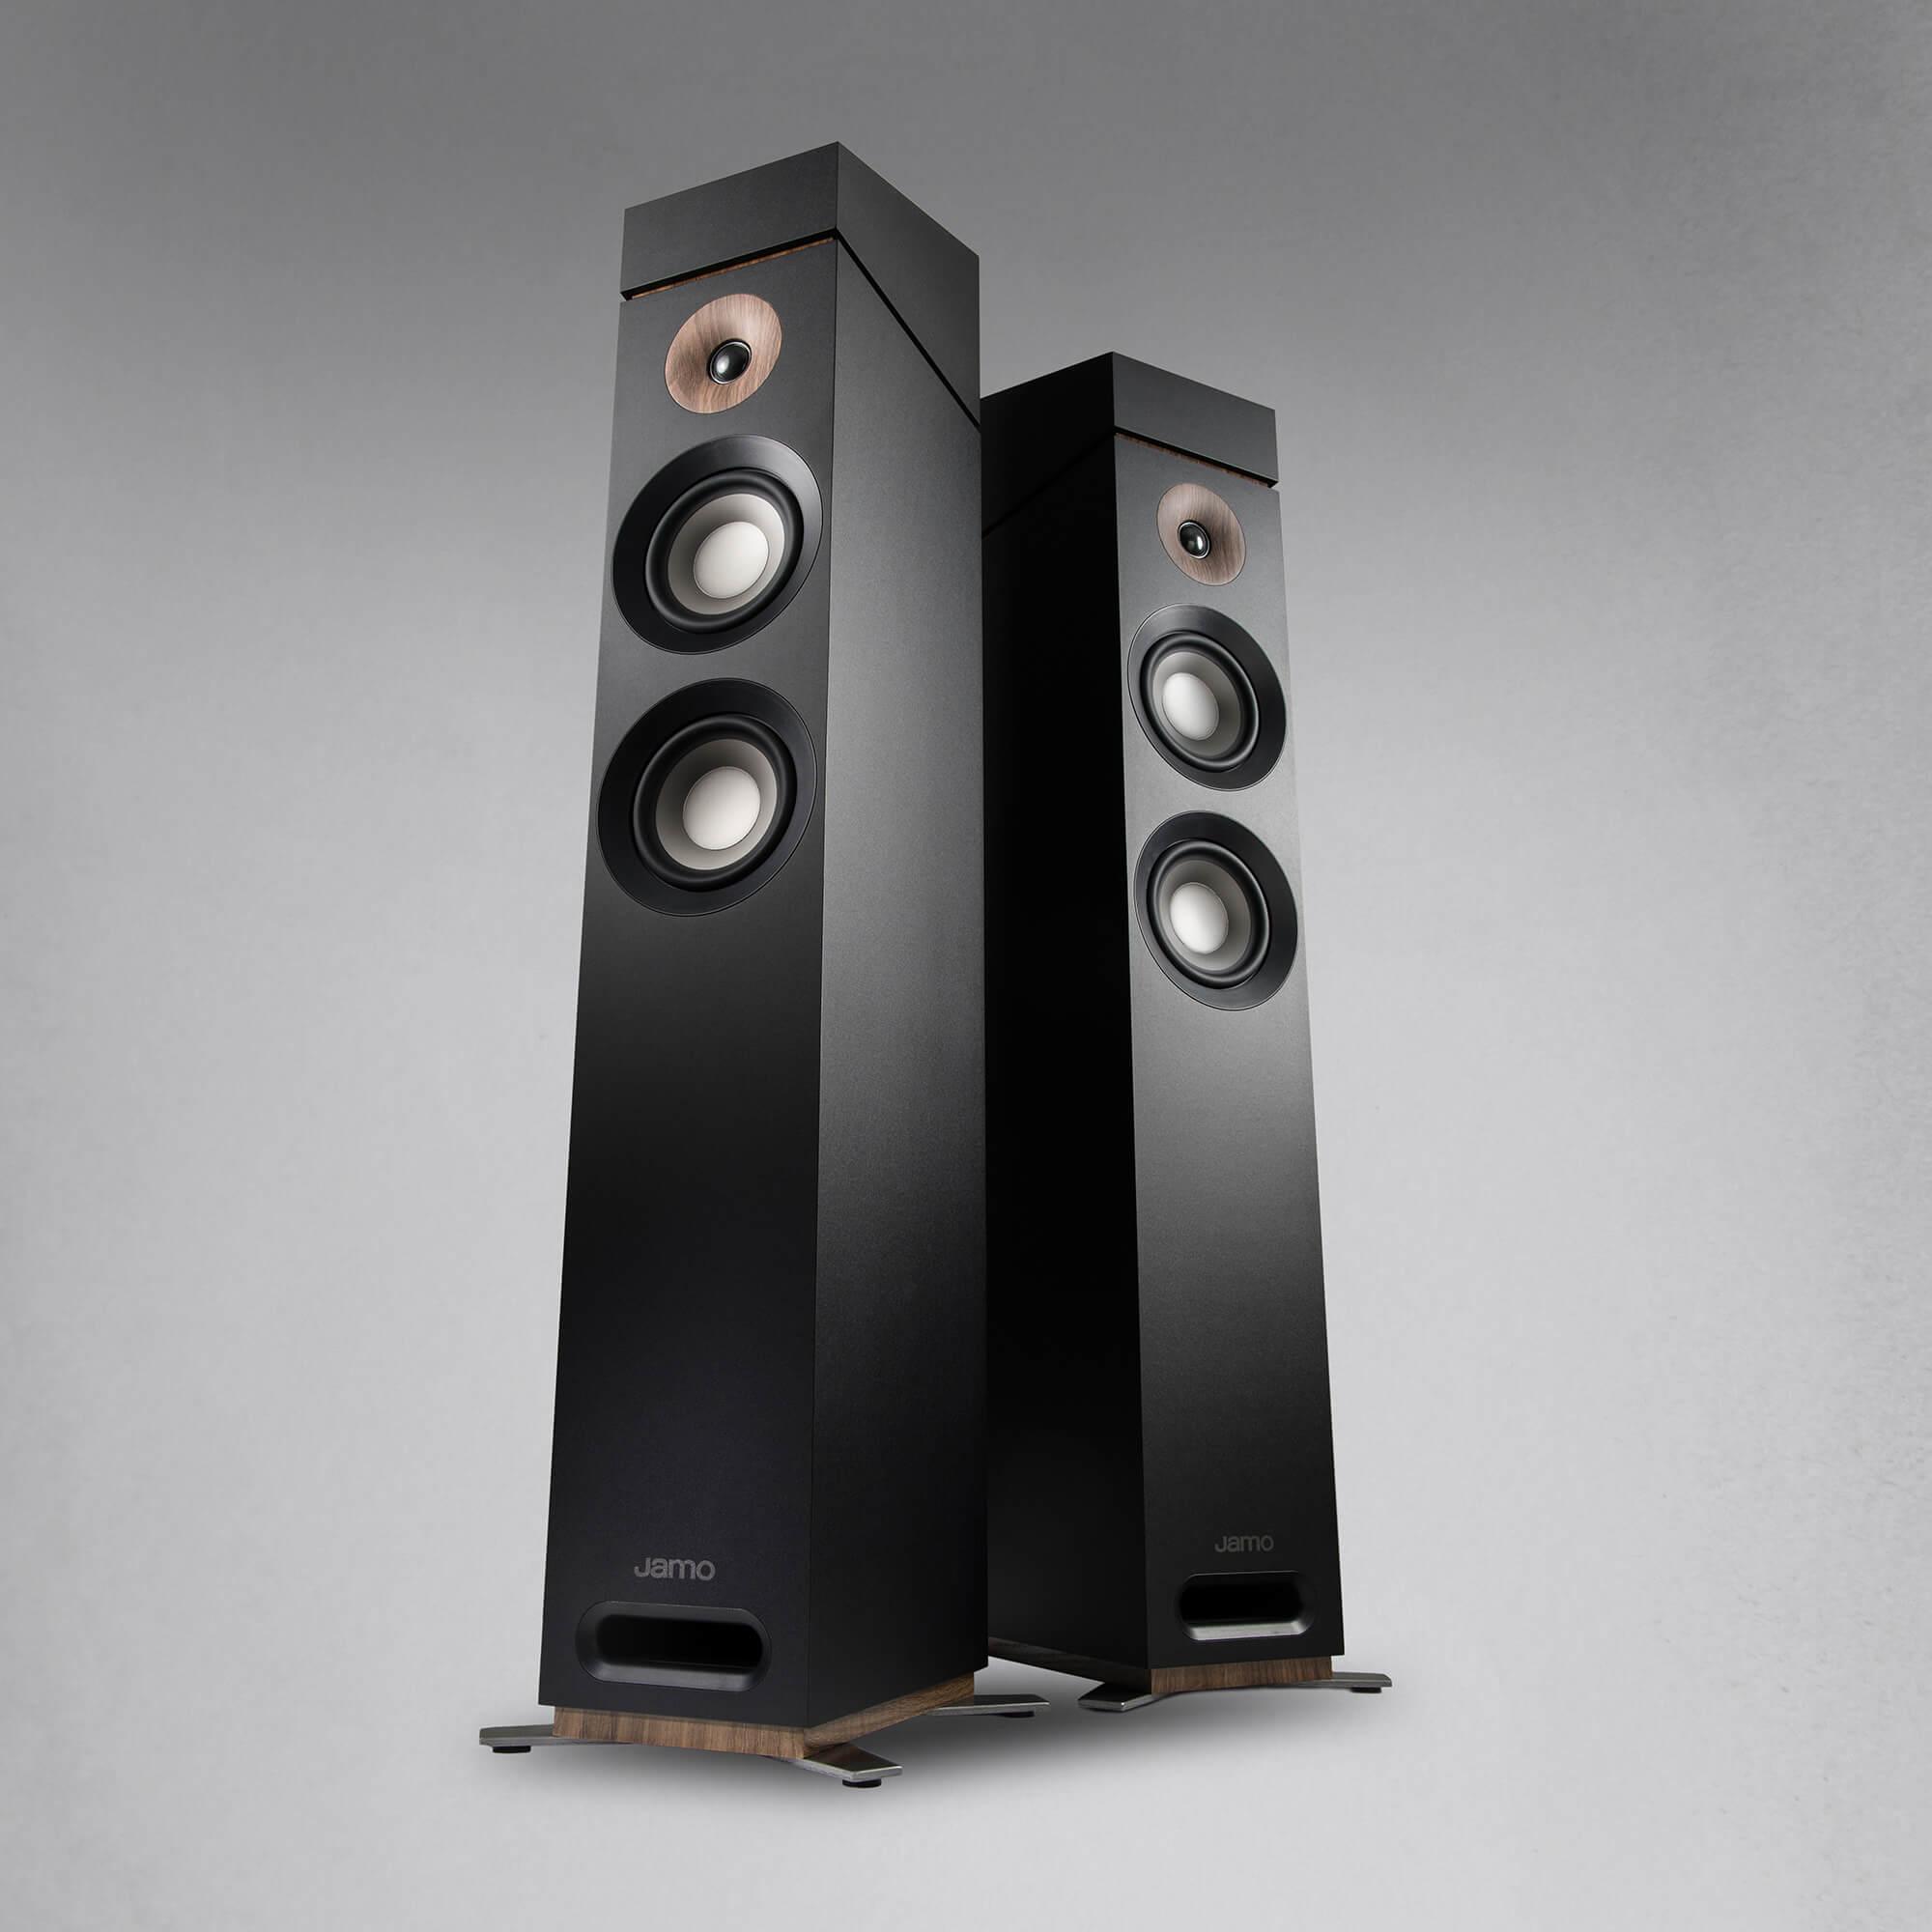 kritisk højttaler jamo-s-807